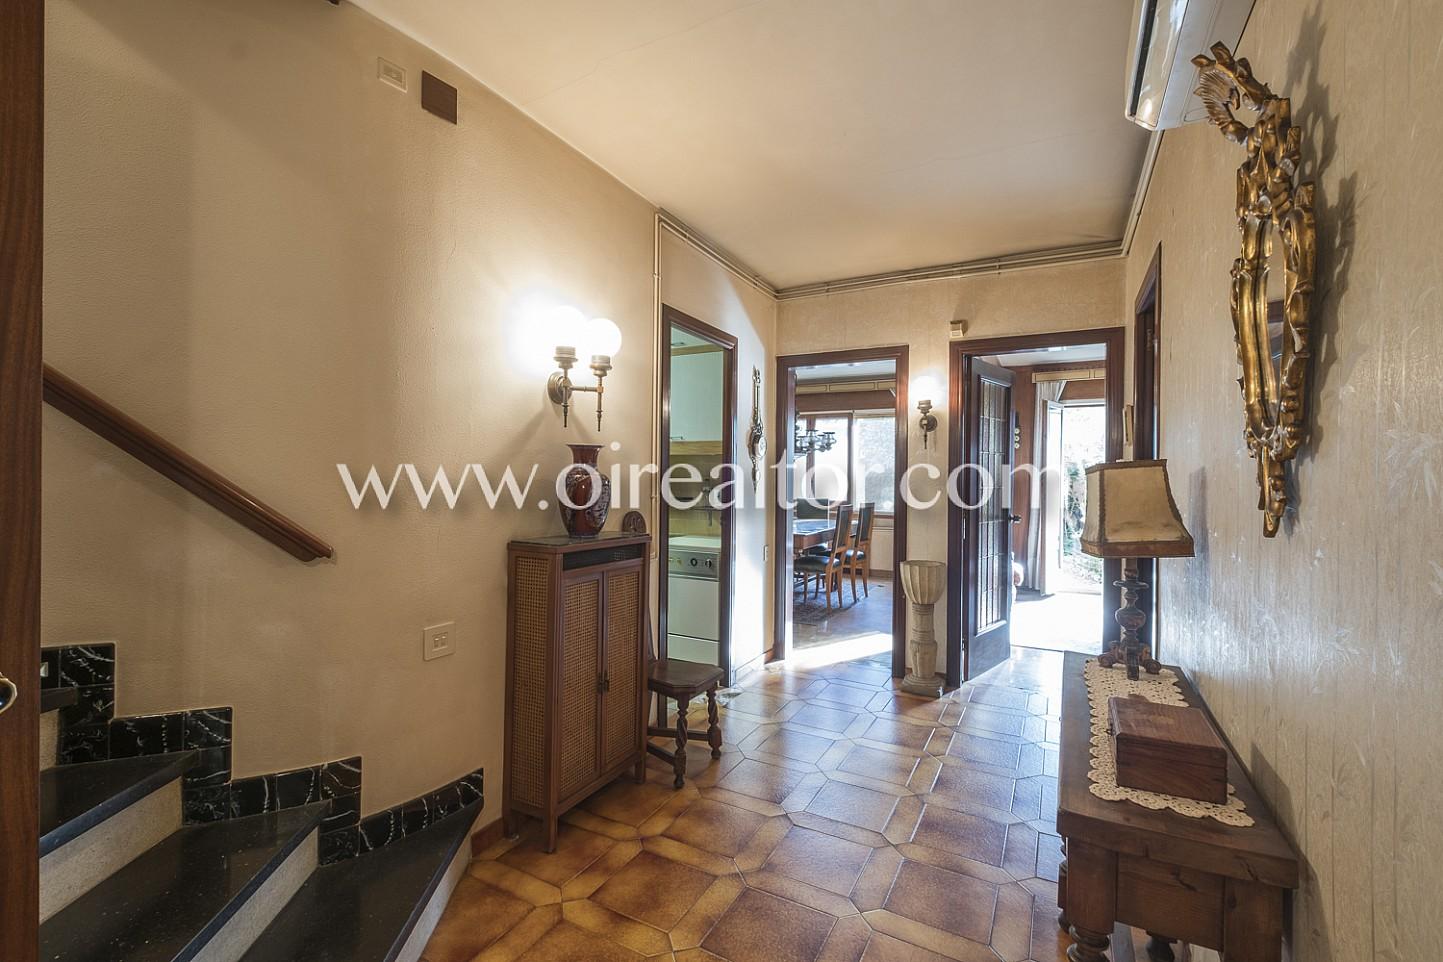 pasillo, pasillo señorial, pasillo clásico, antiguo, habitaciones